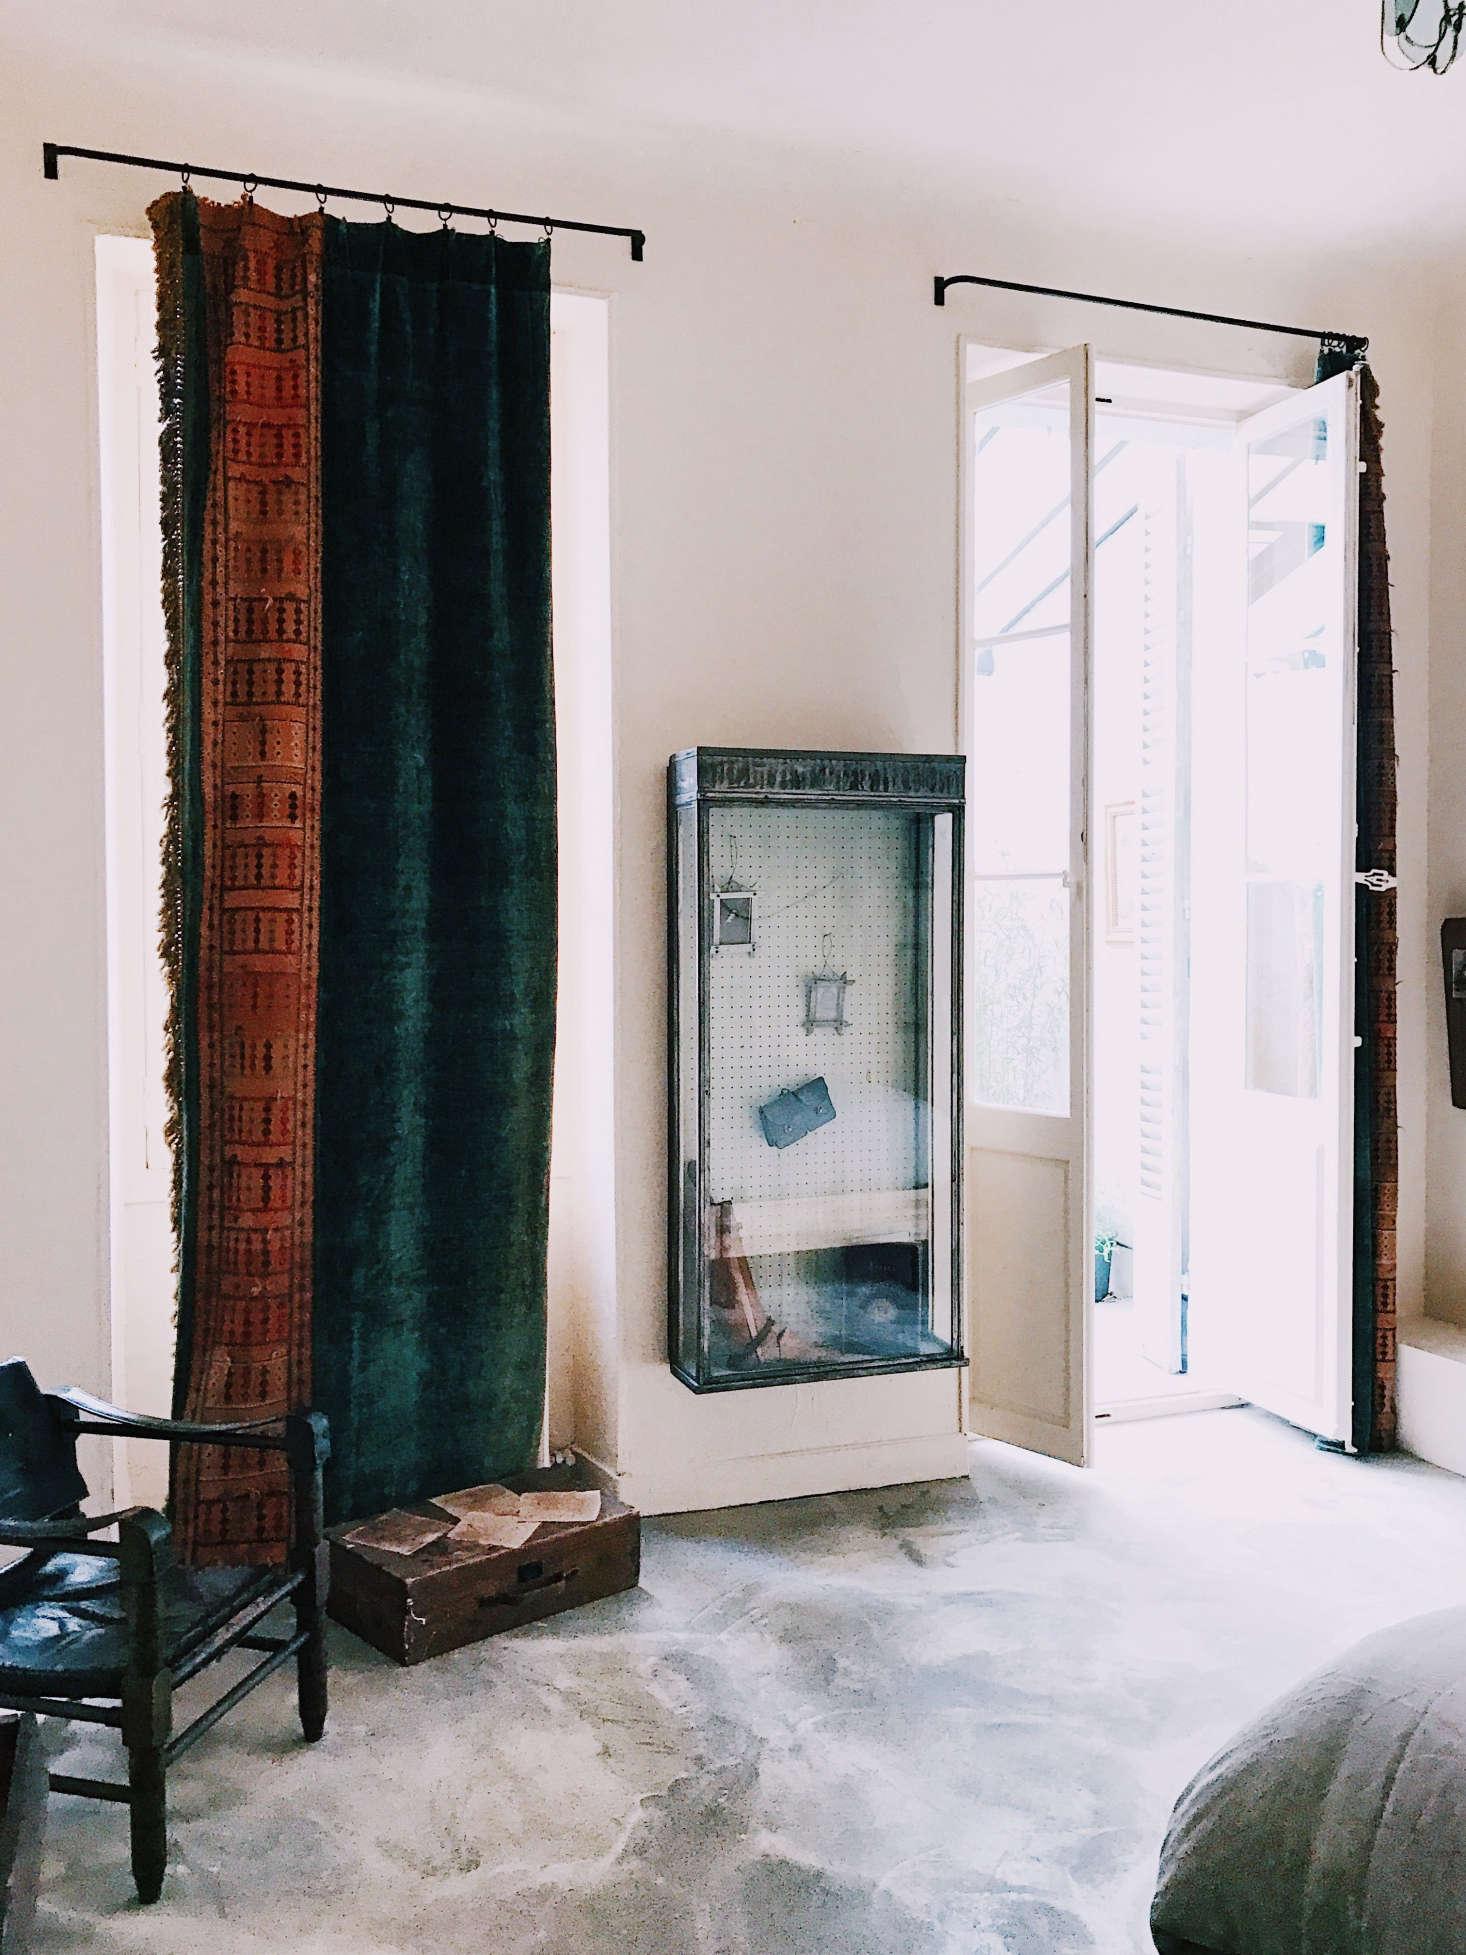 Antique textiles serve as window coverings.